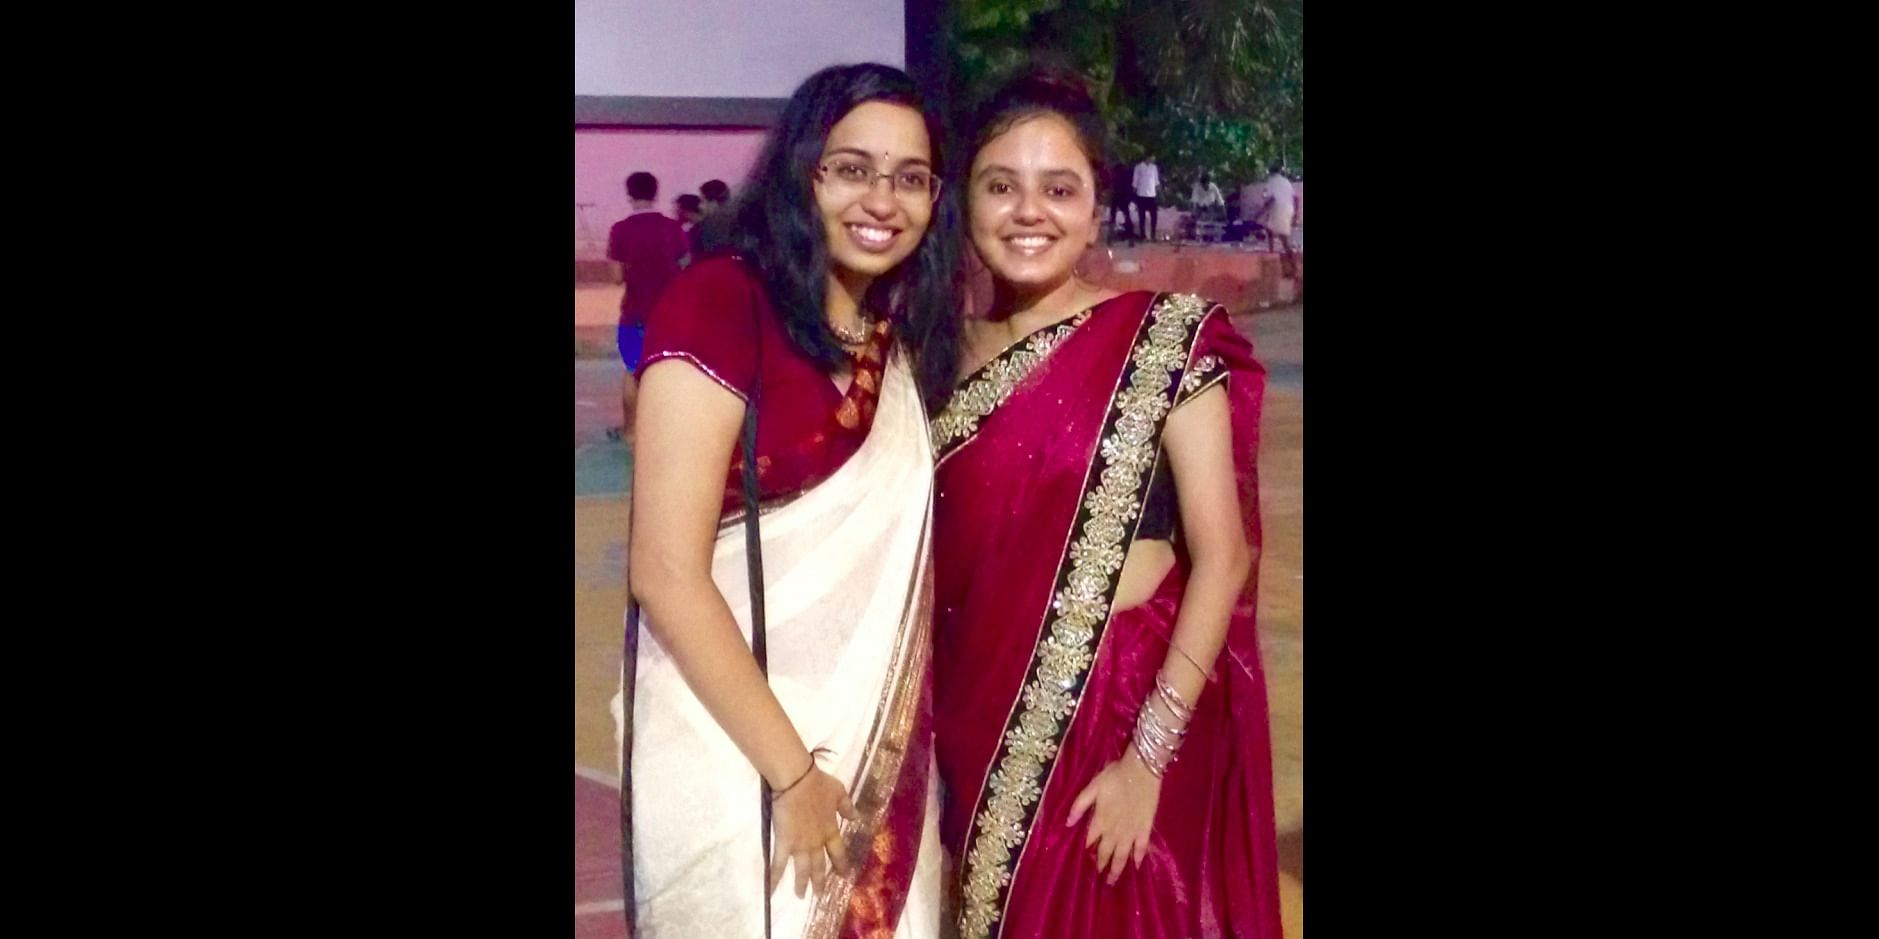 Aditi and Pranali